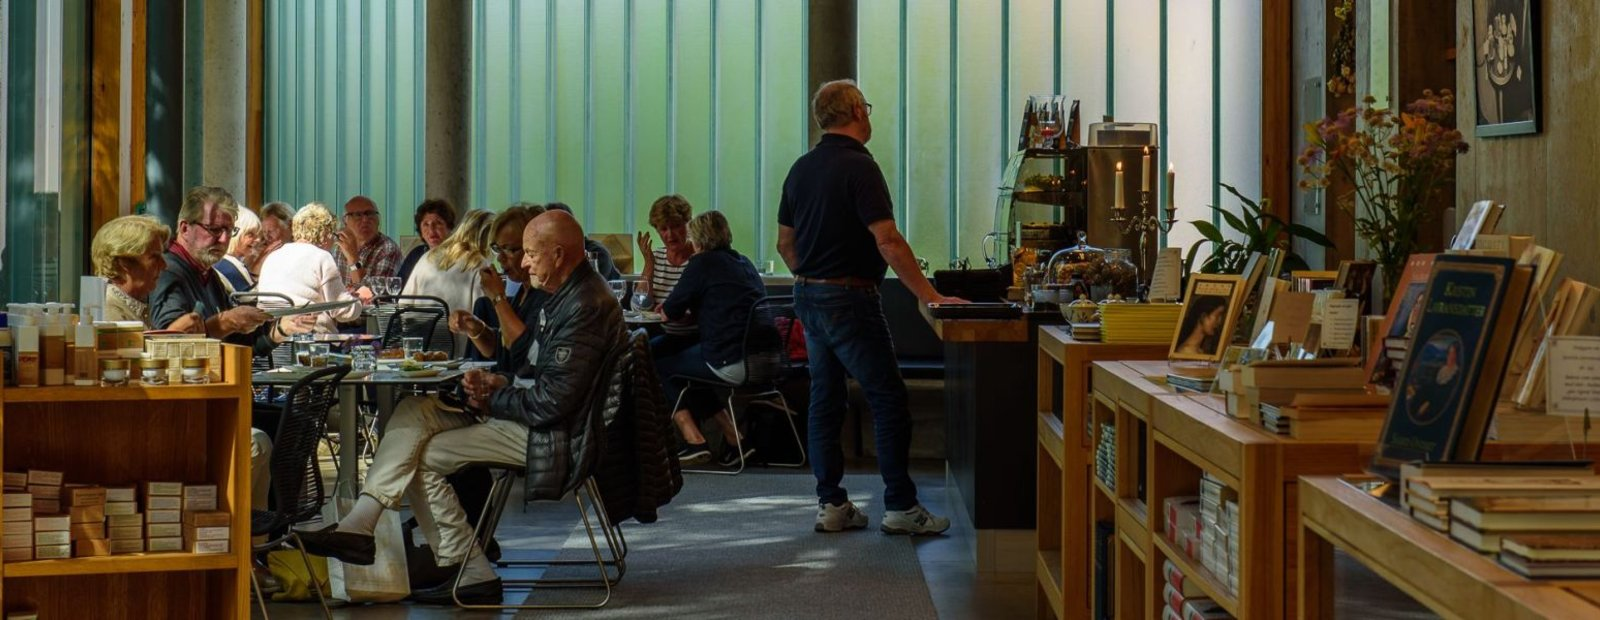 Fra kafeen på Bjerkebæk Sigrid Undsets hjem